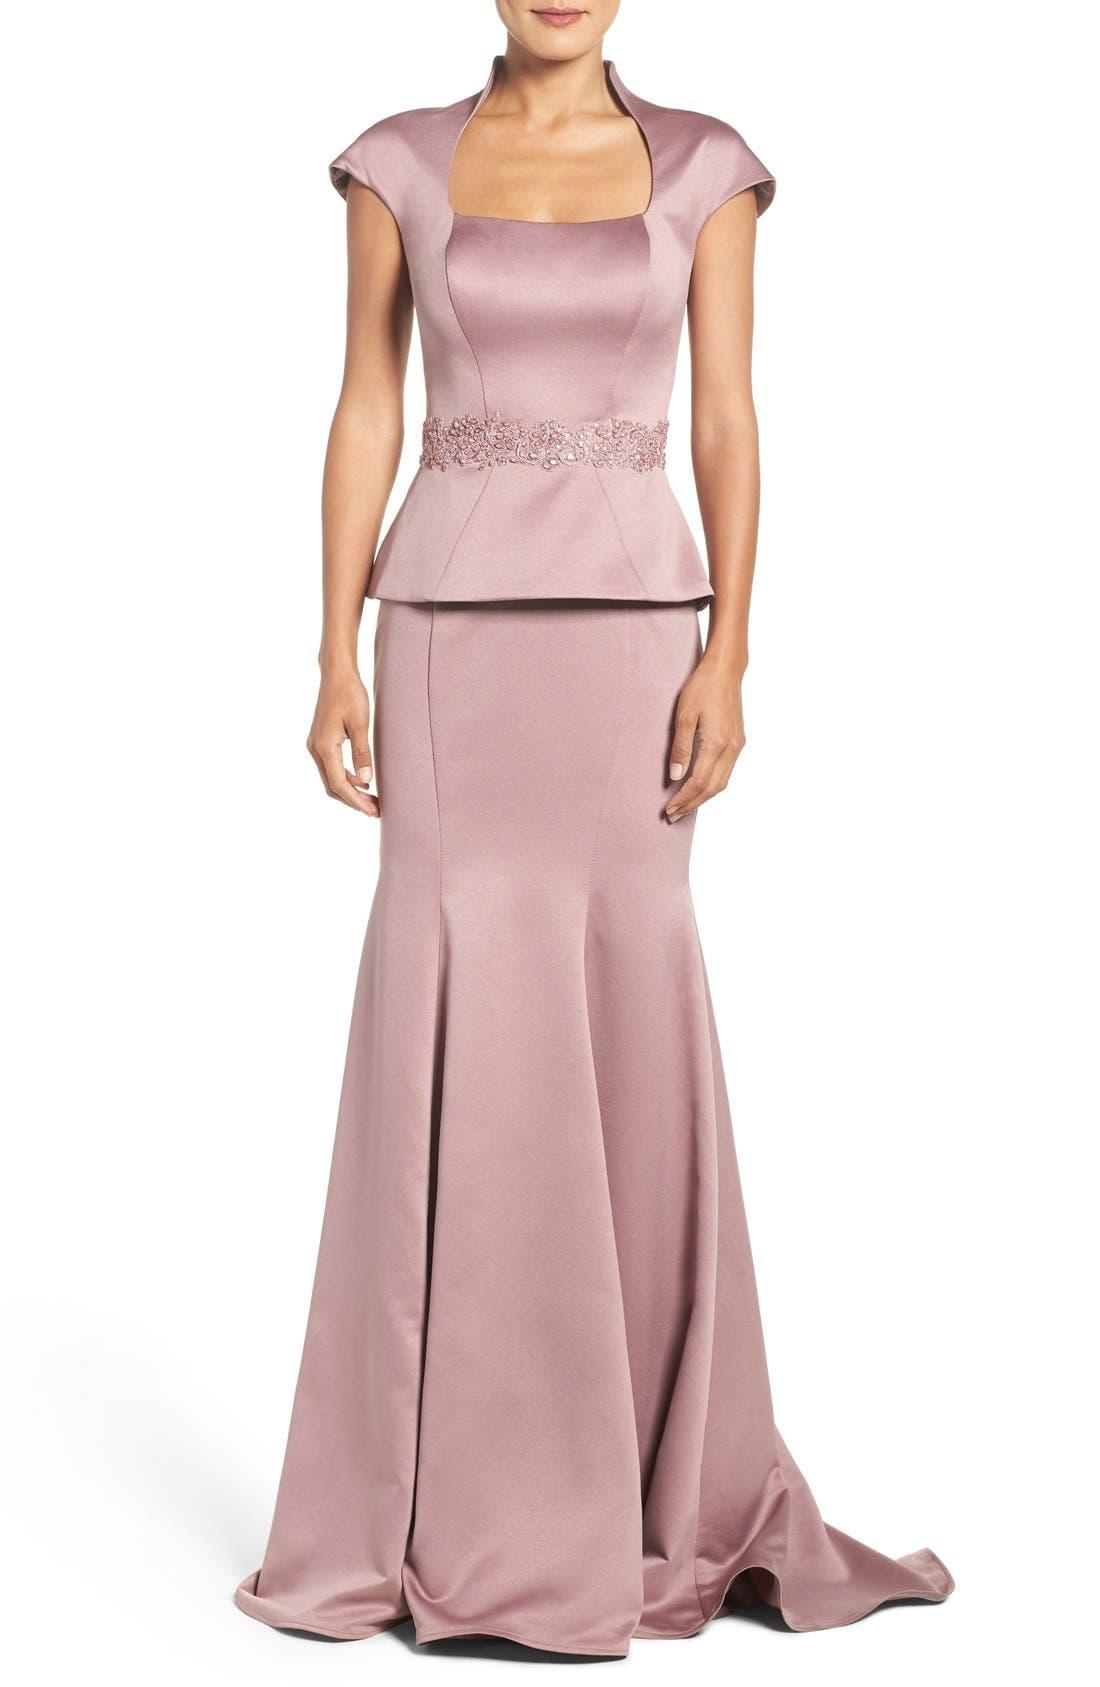 Alternate Image 1 Selected - La Femme Mock Two-Piece Satin Gown